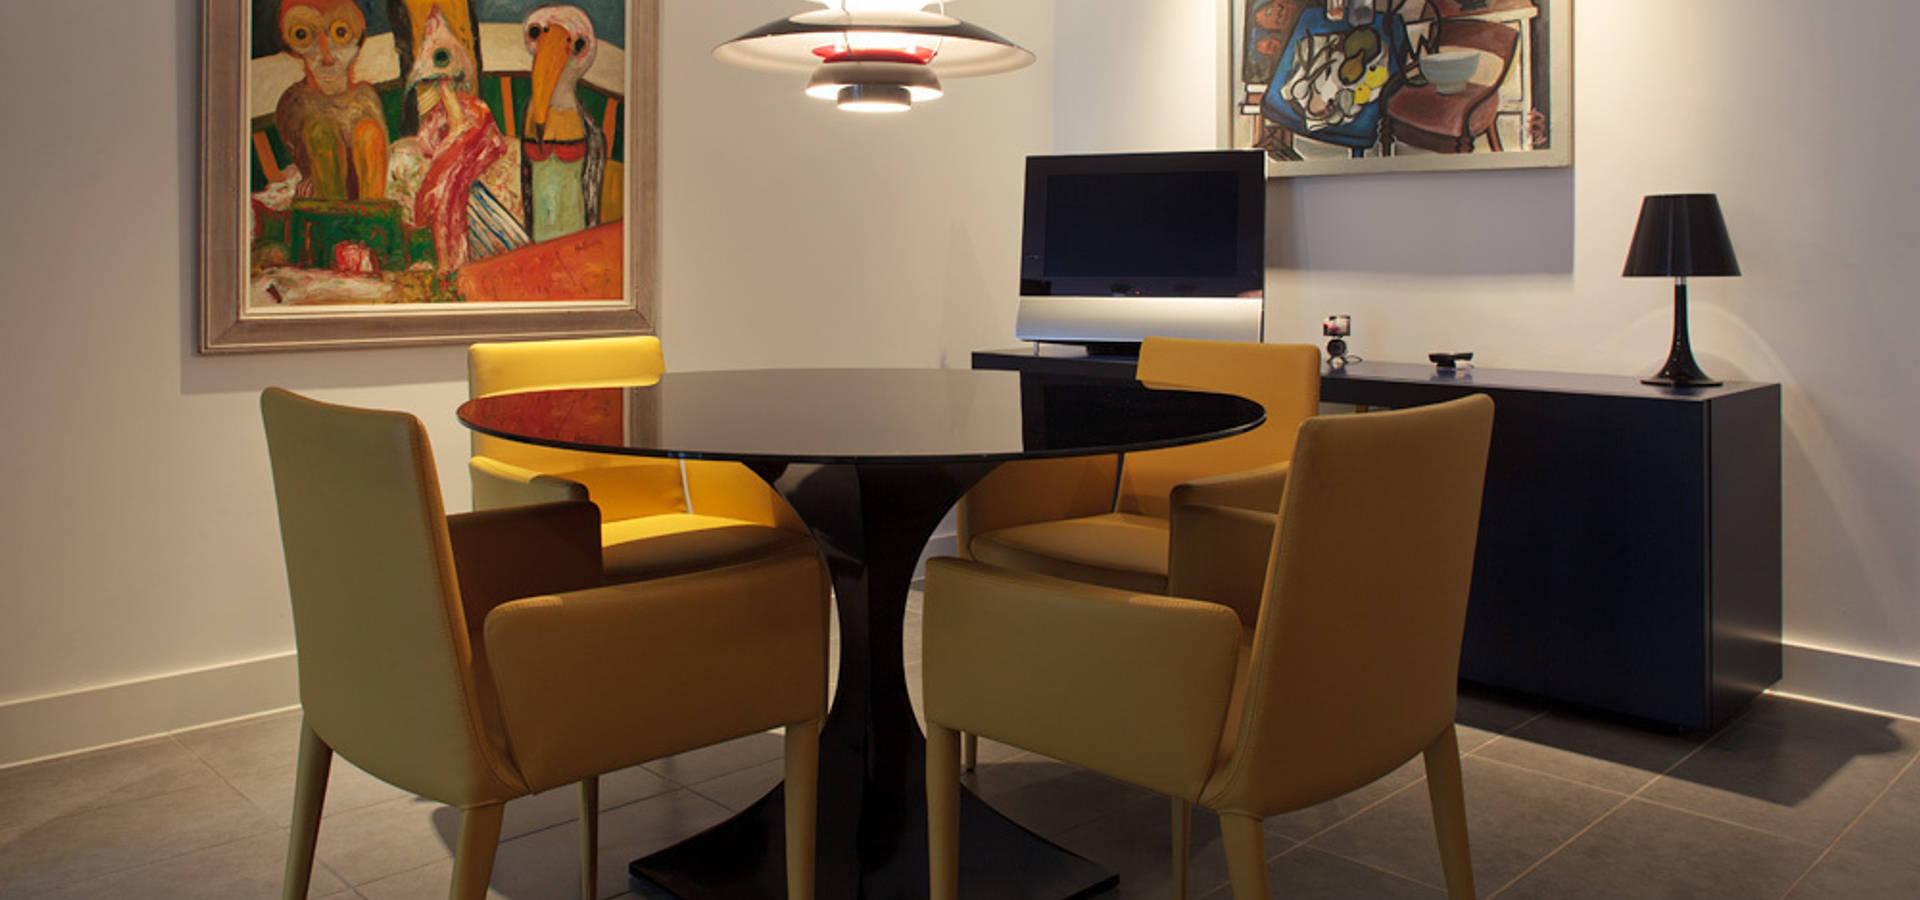 At Home Interior Design Consultants